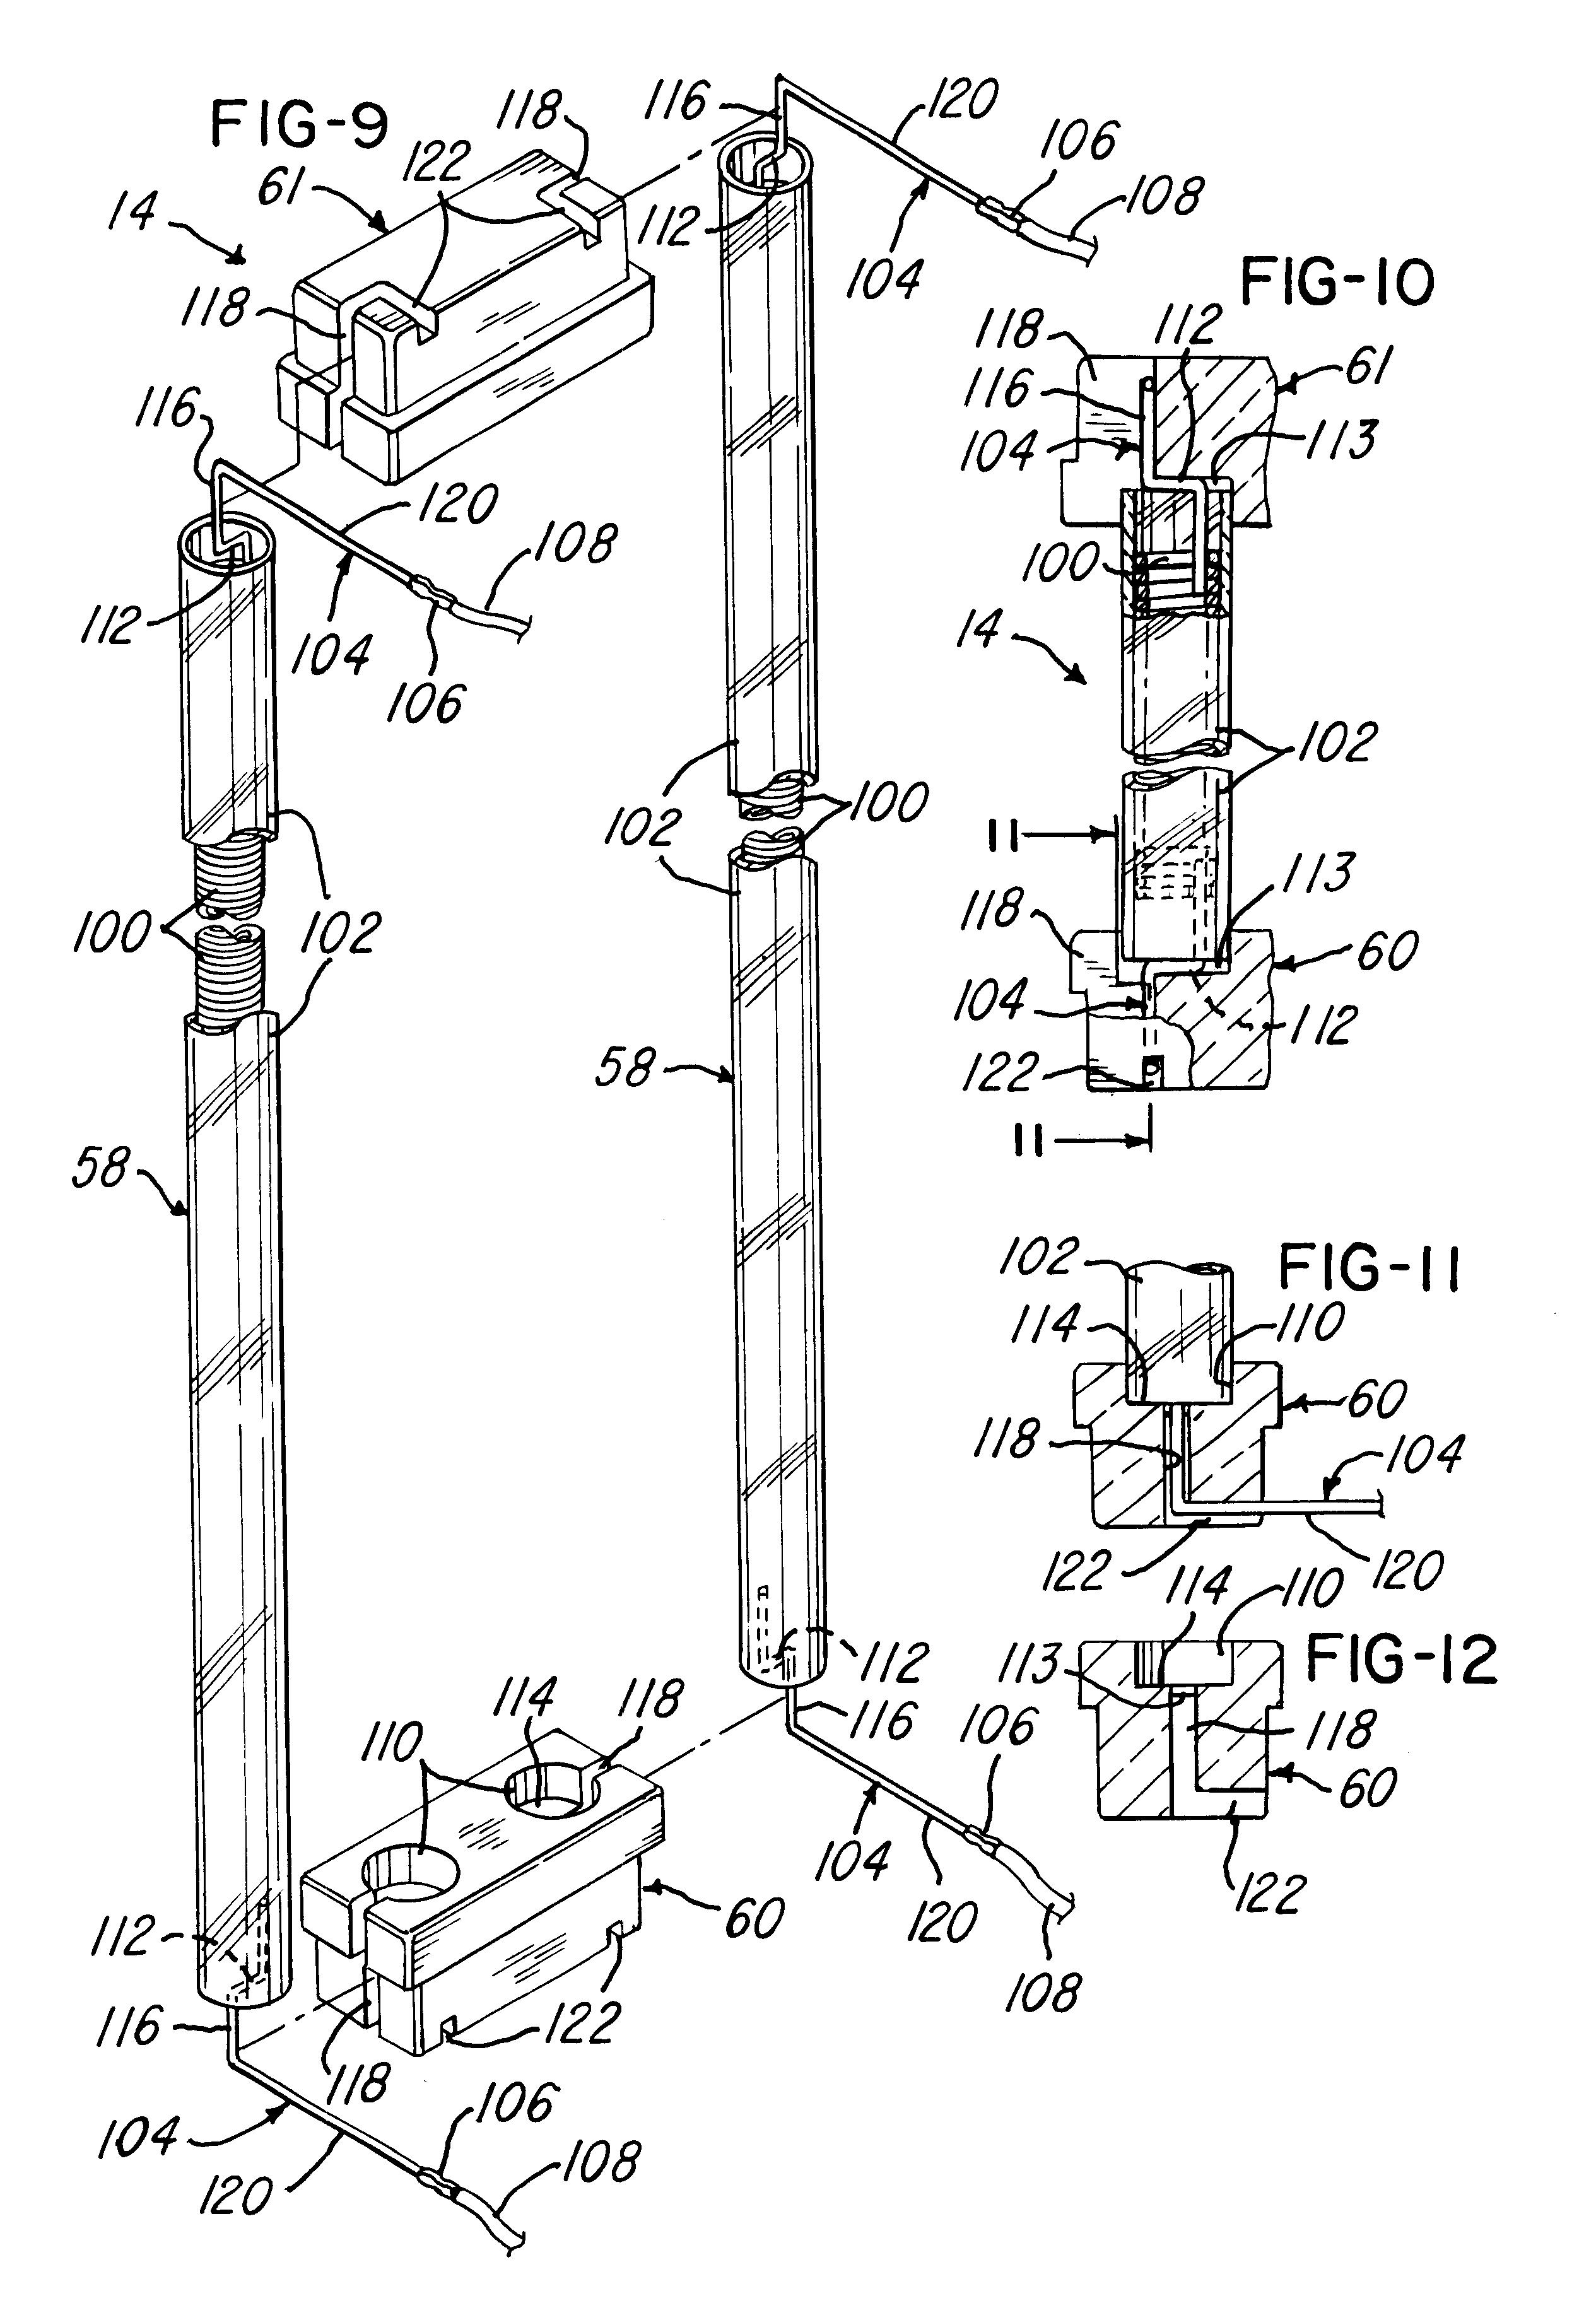 Electric Space Heater Wiring Diagram : 36 Wiring Diagram